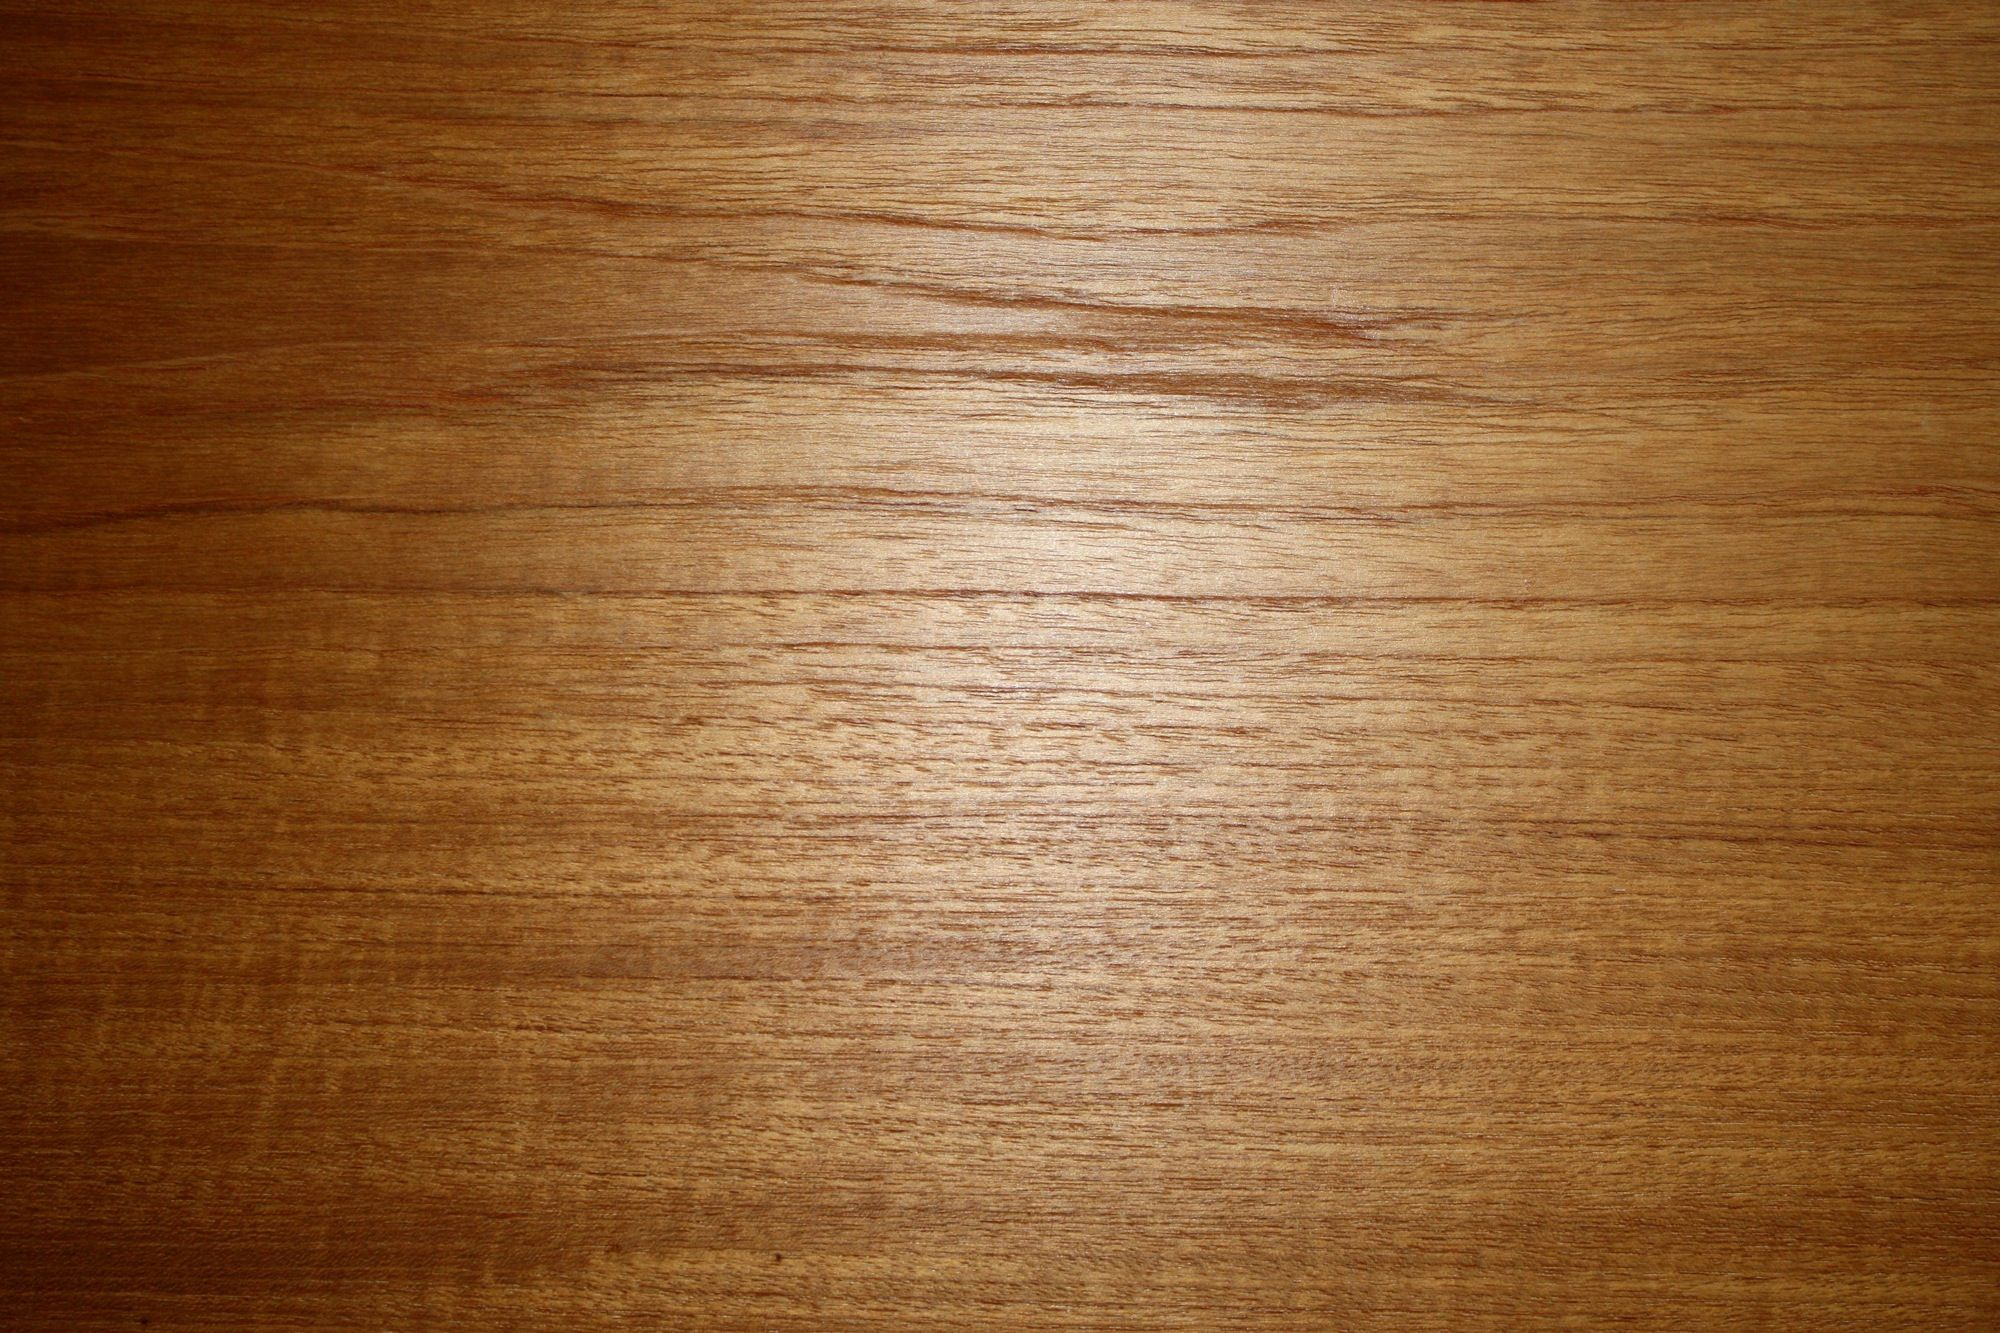 7th Hill Eastern Market Wood Grain Texture Wood Wallpaper Wood Grain Tile